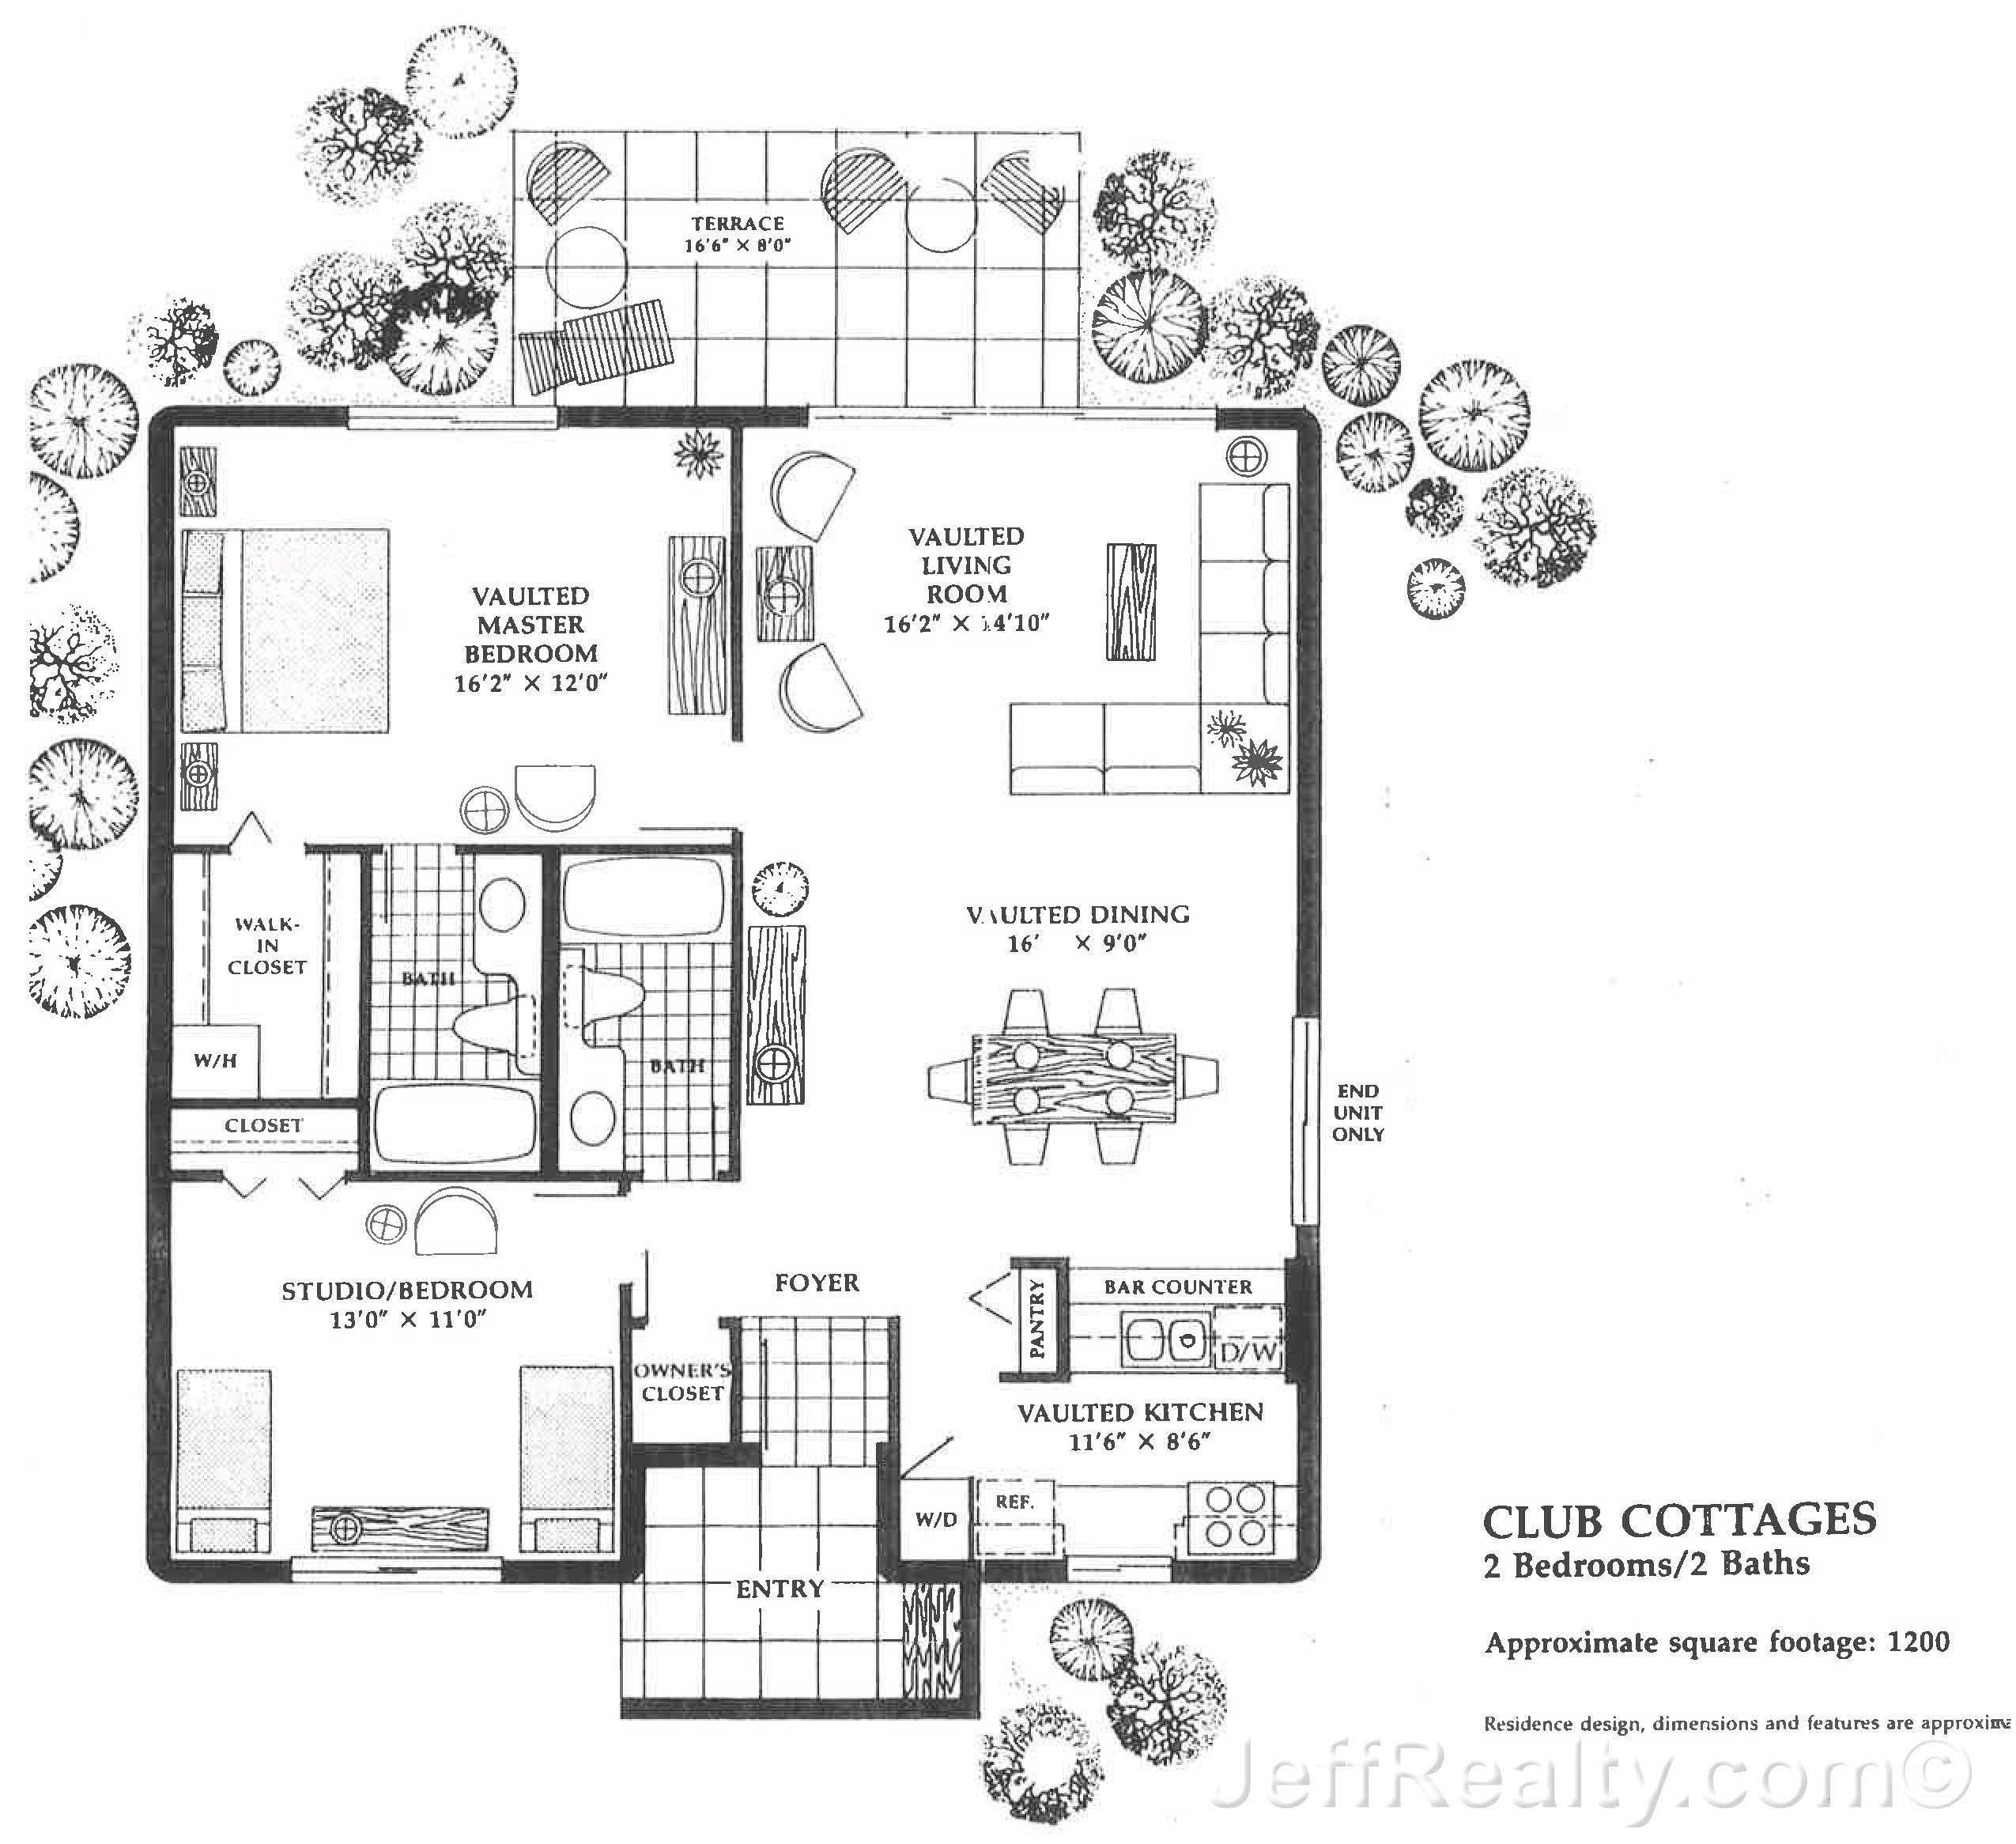 727bcd6c2bff888237917a81aeceba07 - Alton Palm Beach Gardens Site Plan